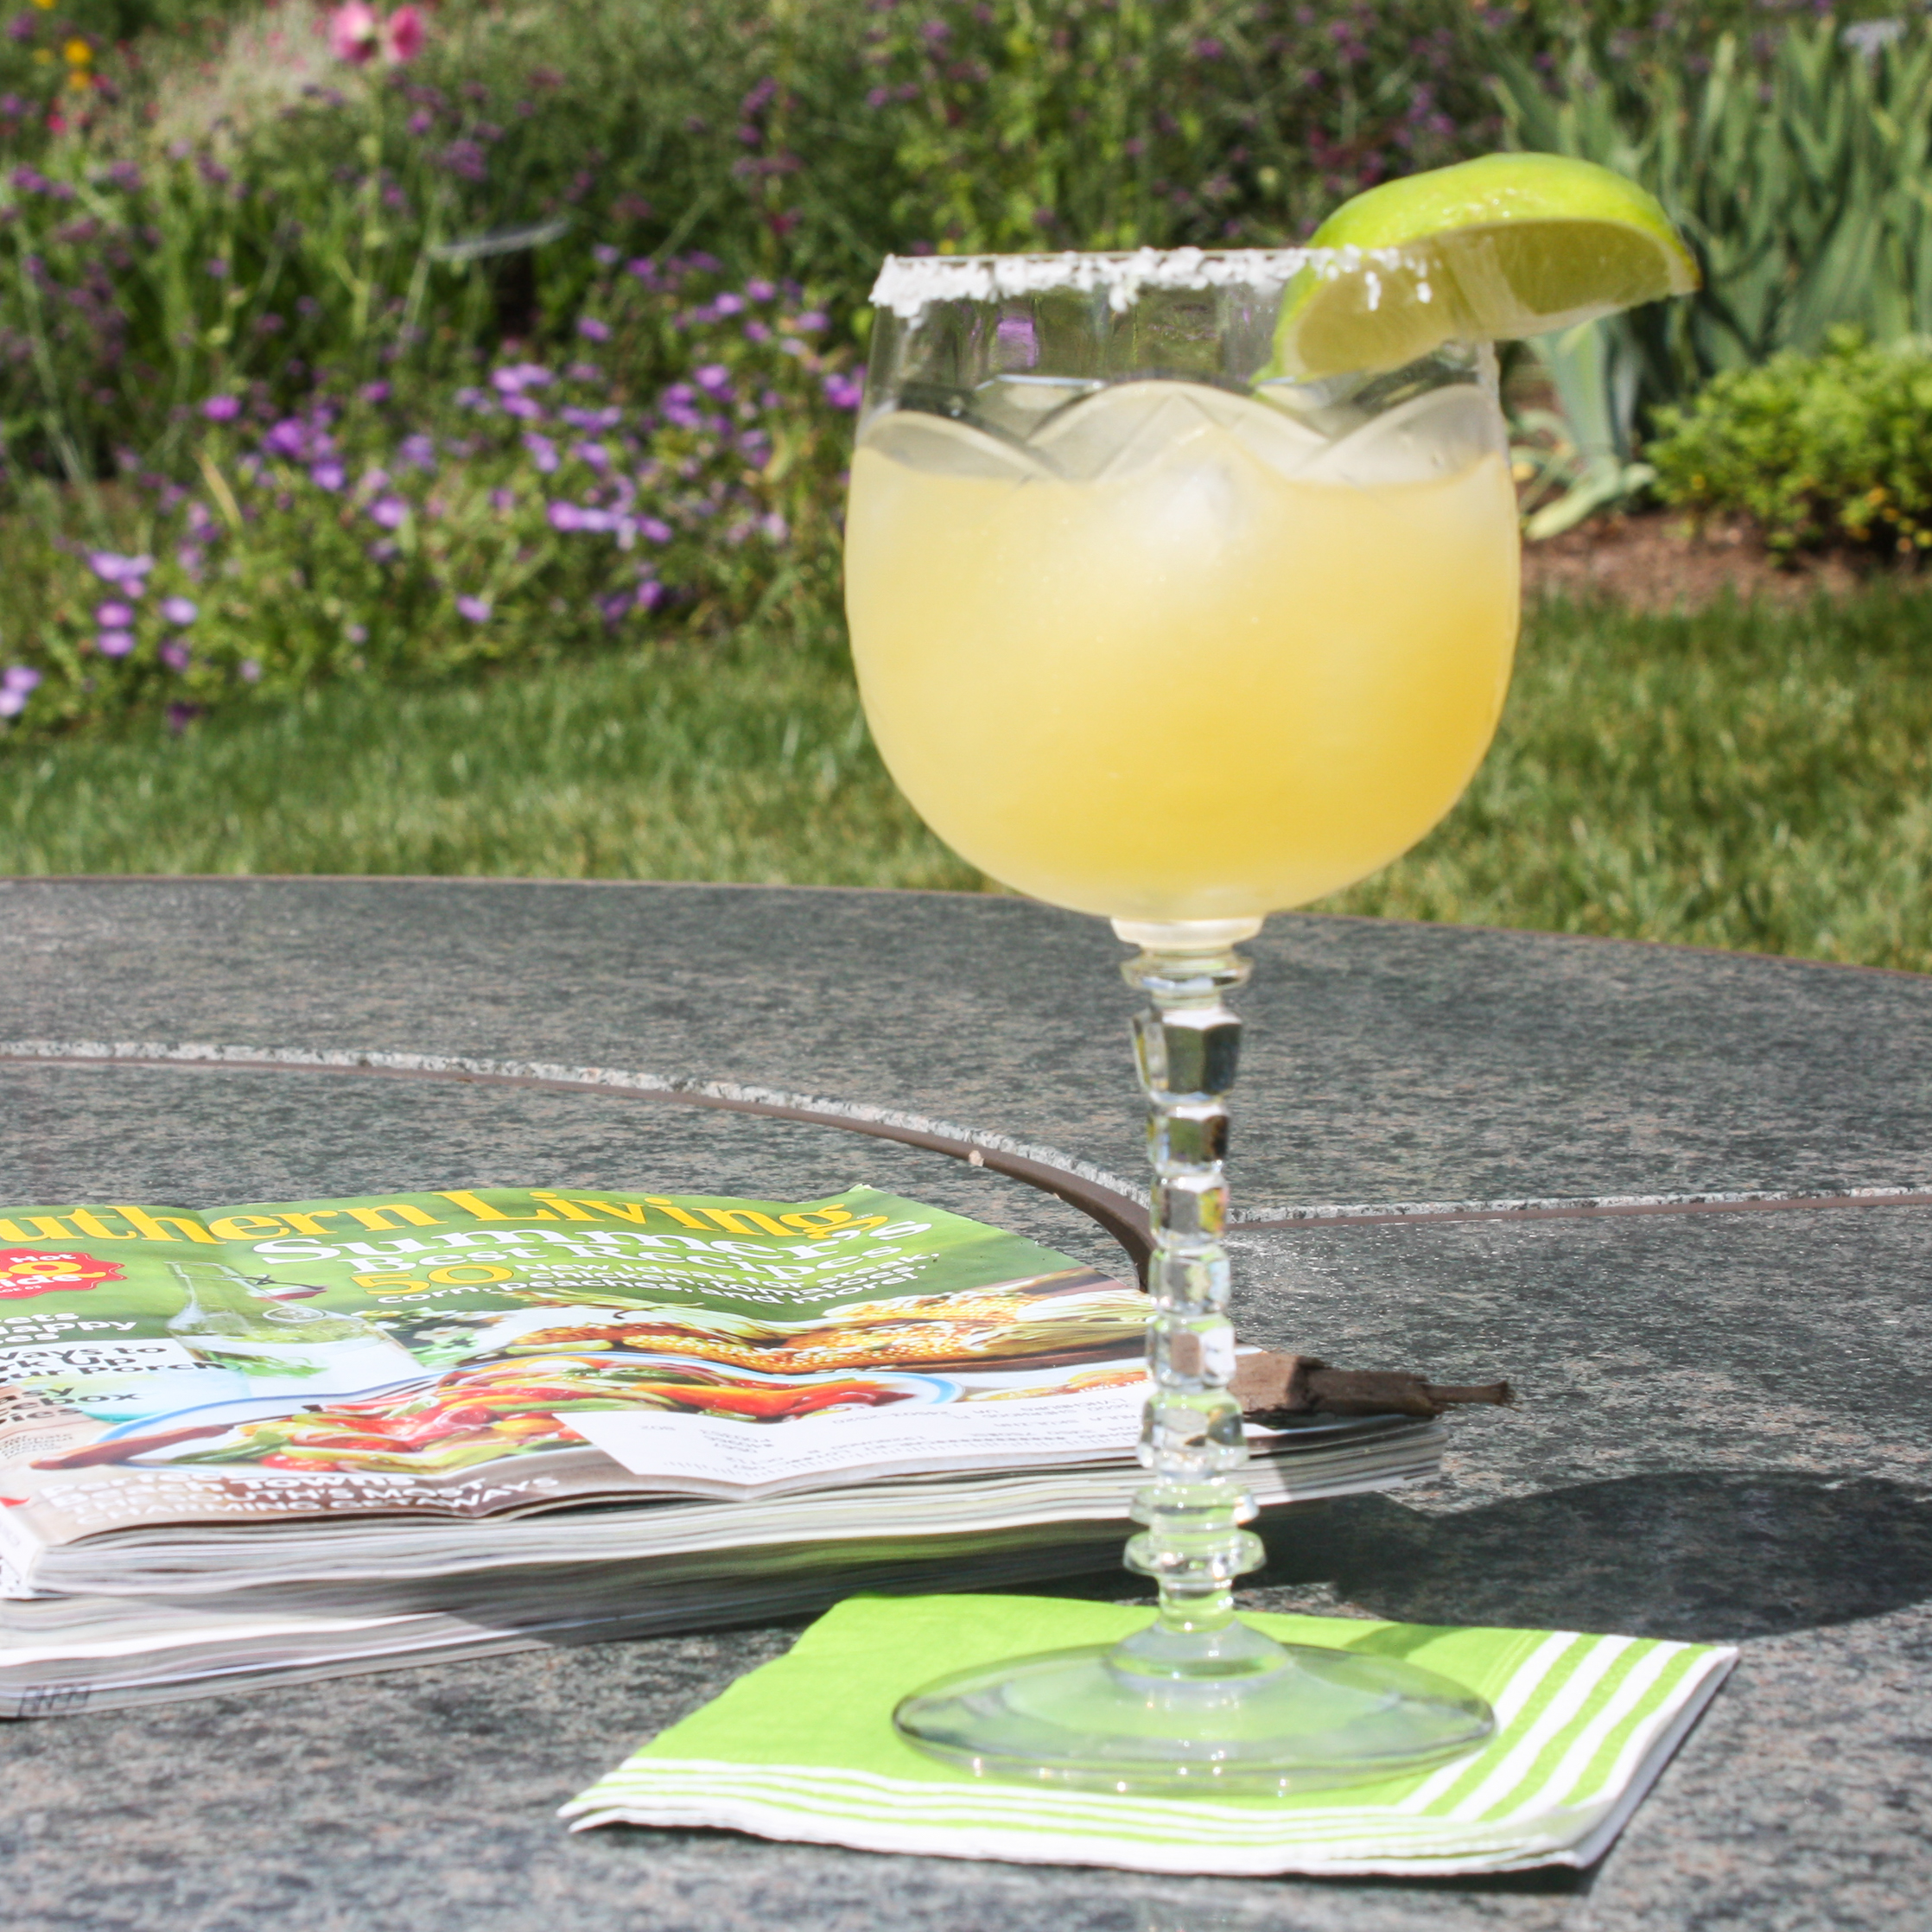 105 Calorie Margarita - Enjoy a low-calorie Margarita without guilt! #bebadas #cincodemayo #margaritas #tequila #happycincodemayo